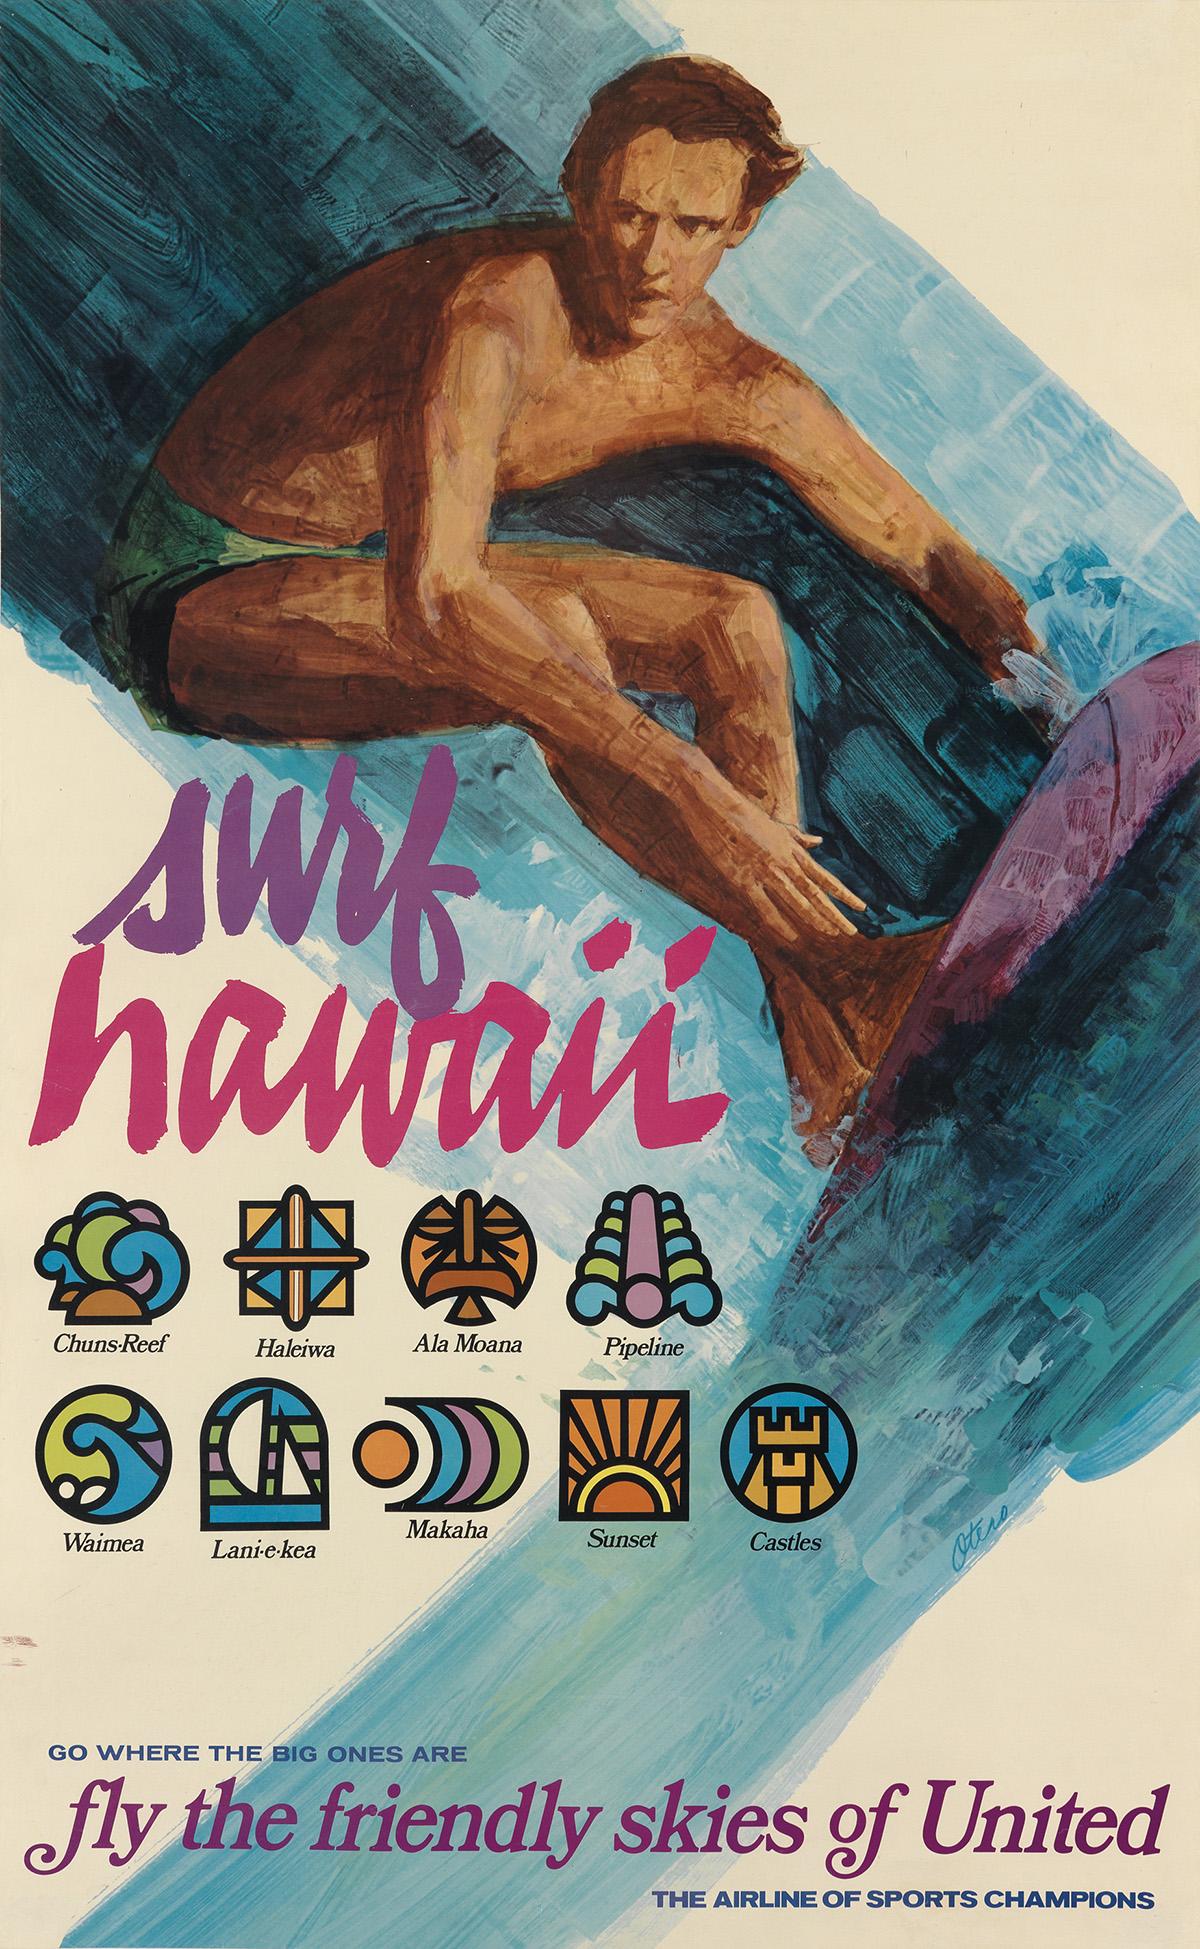 OTERO-(DATES-UNKNOWN)-SURF-HAWAII--UNITED-Circa-1970s-40x25-